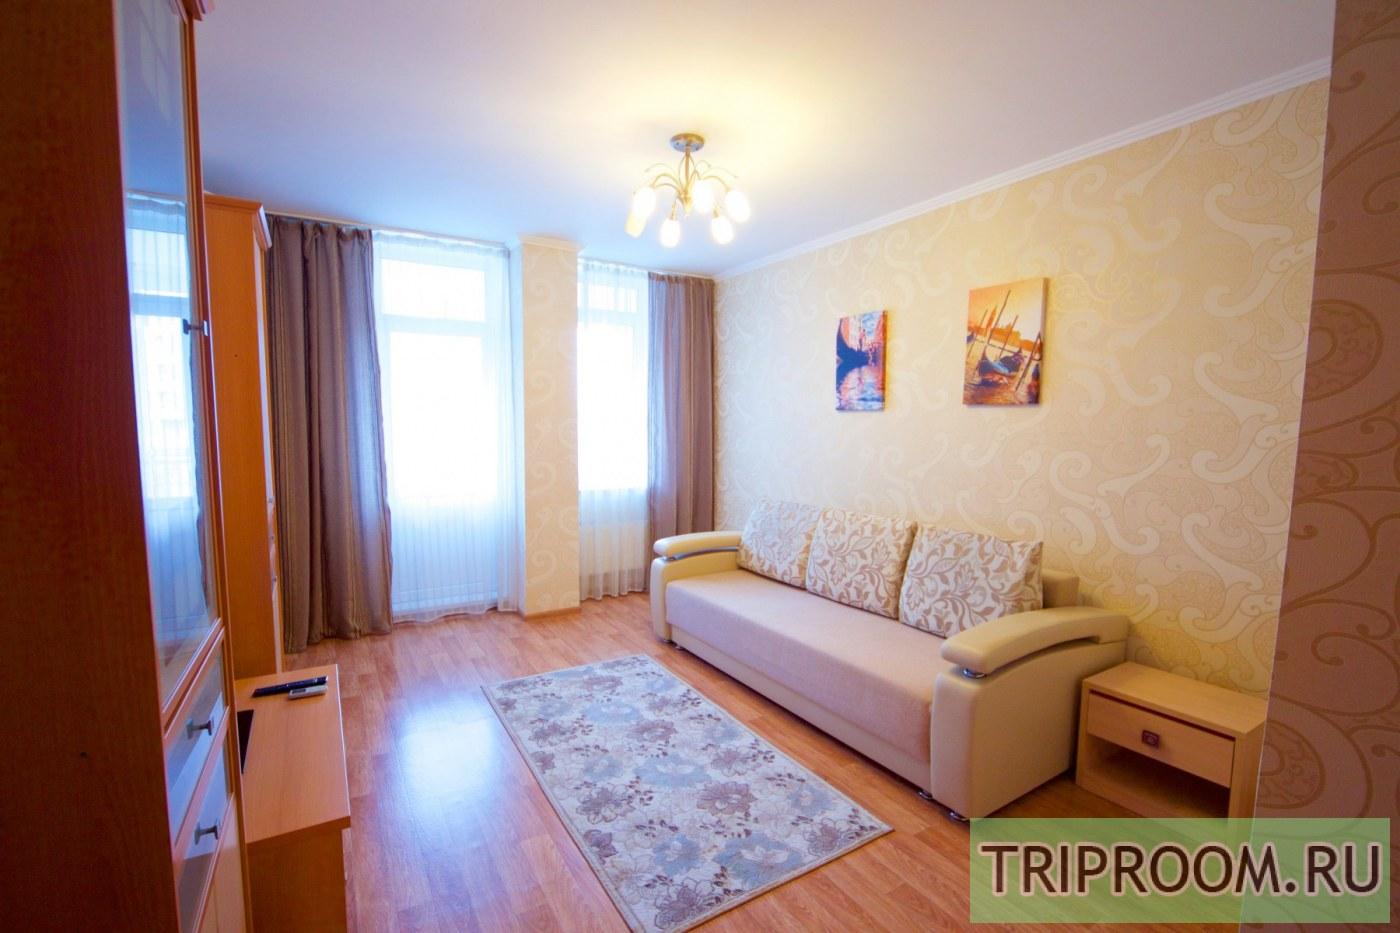 1-комнатная квартира посуточно (вариант № 40369), ул. Алексеева улица, фото № 1